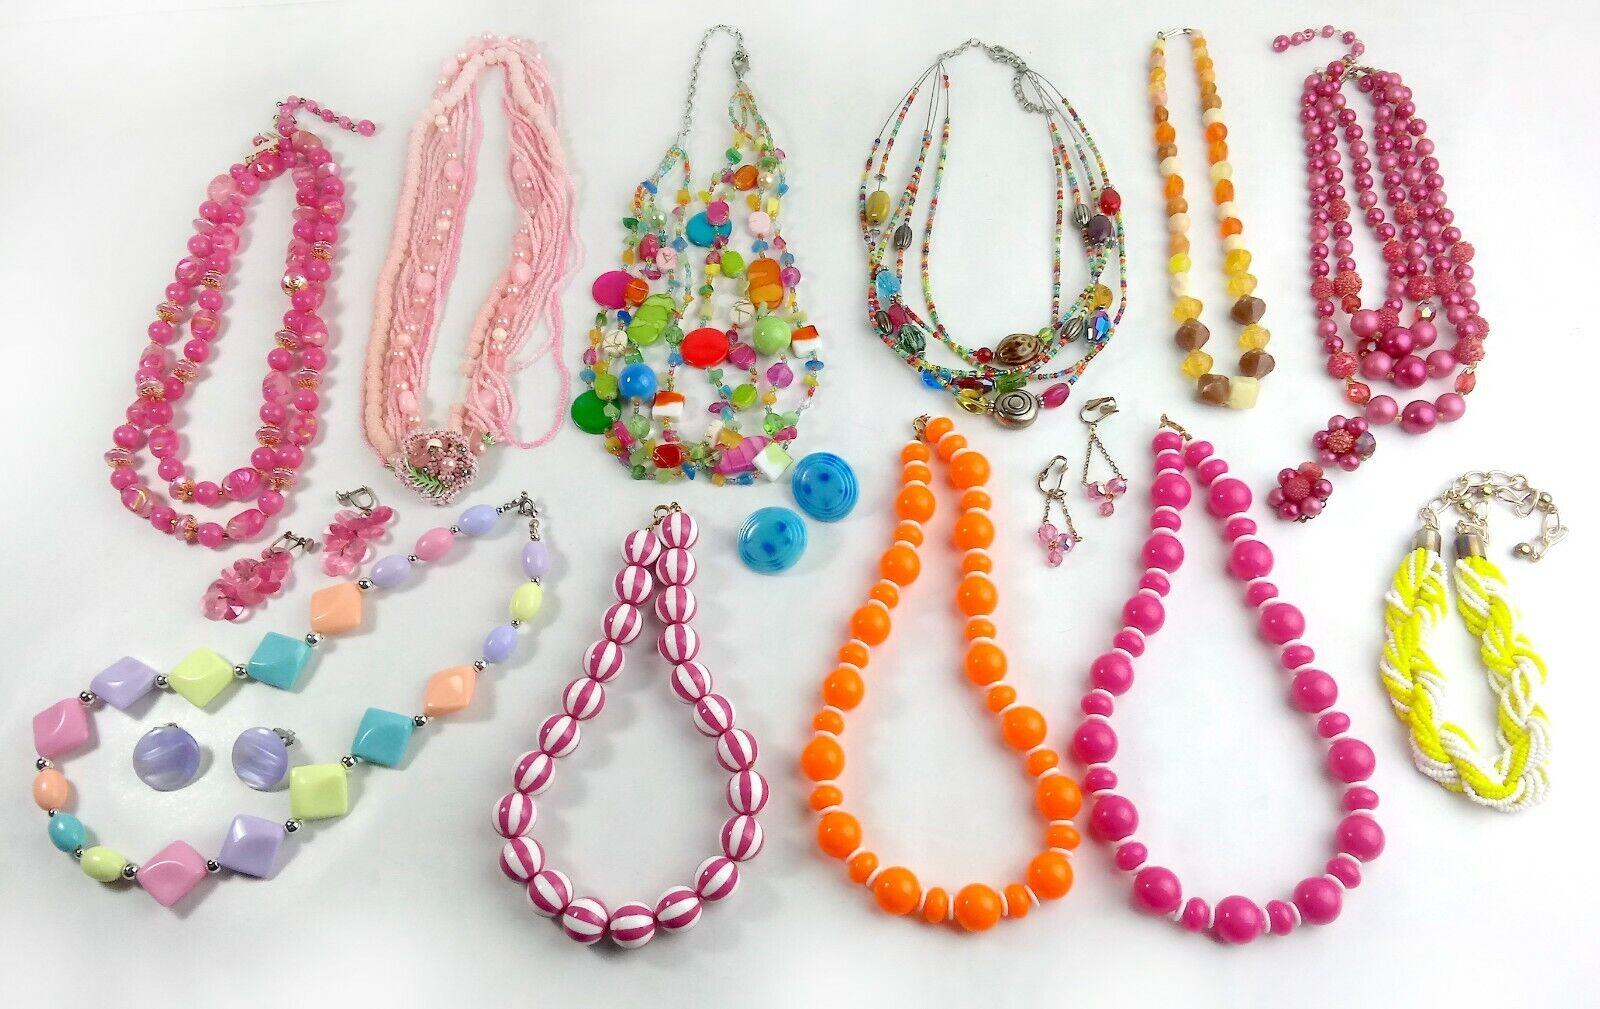 Costume Jewelry Lot Necklaces Bracelet Earrings - image 1